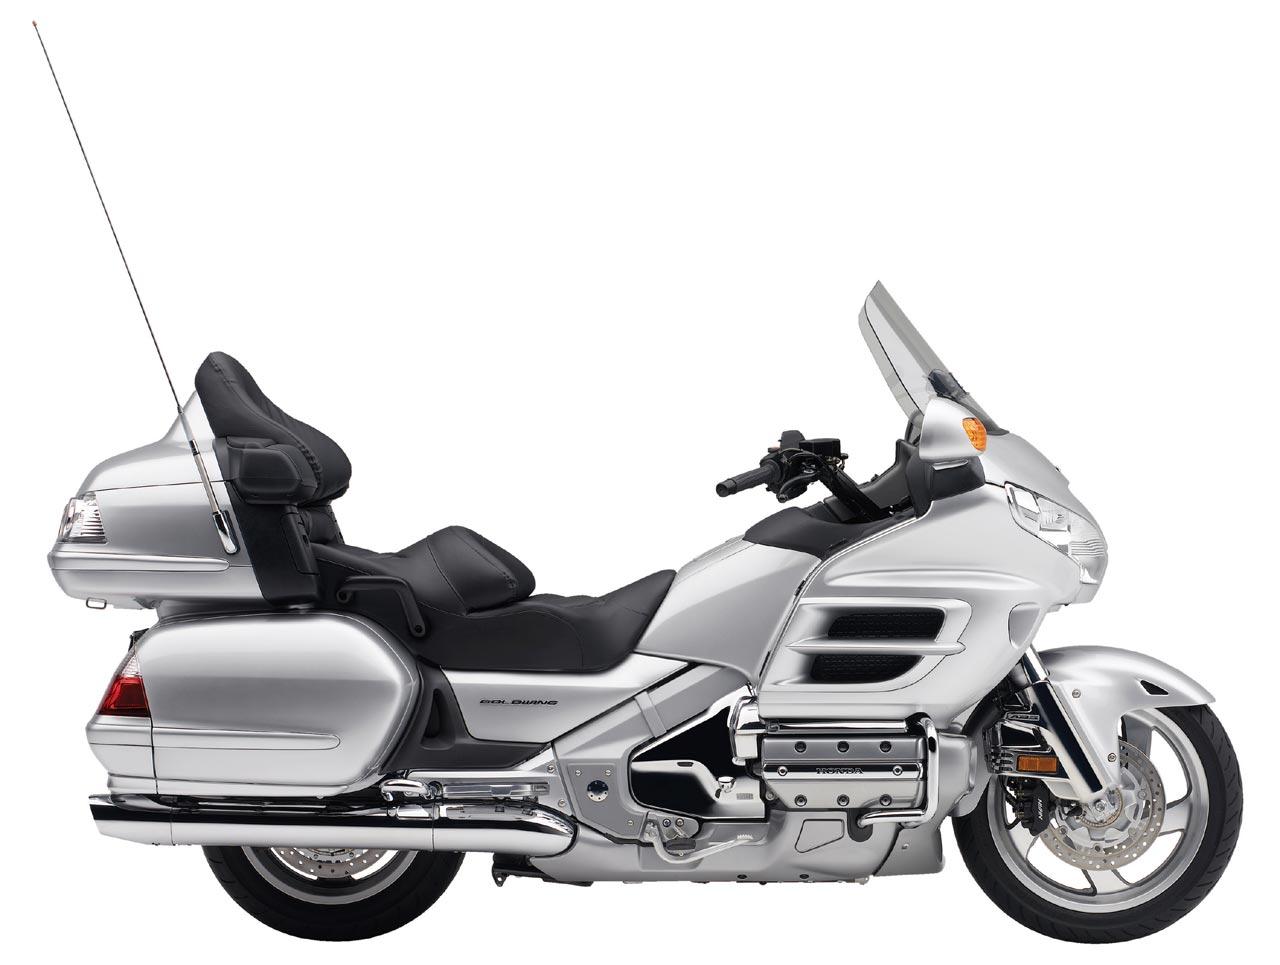 honda goldwing gl 1800 motorcycle. Black Bedroom Furniture Sets. Home Design Ideas